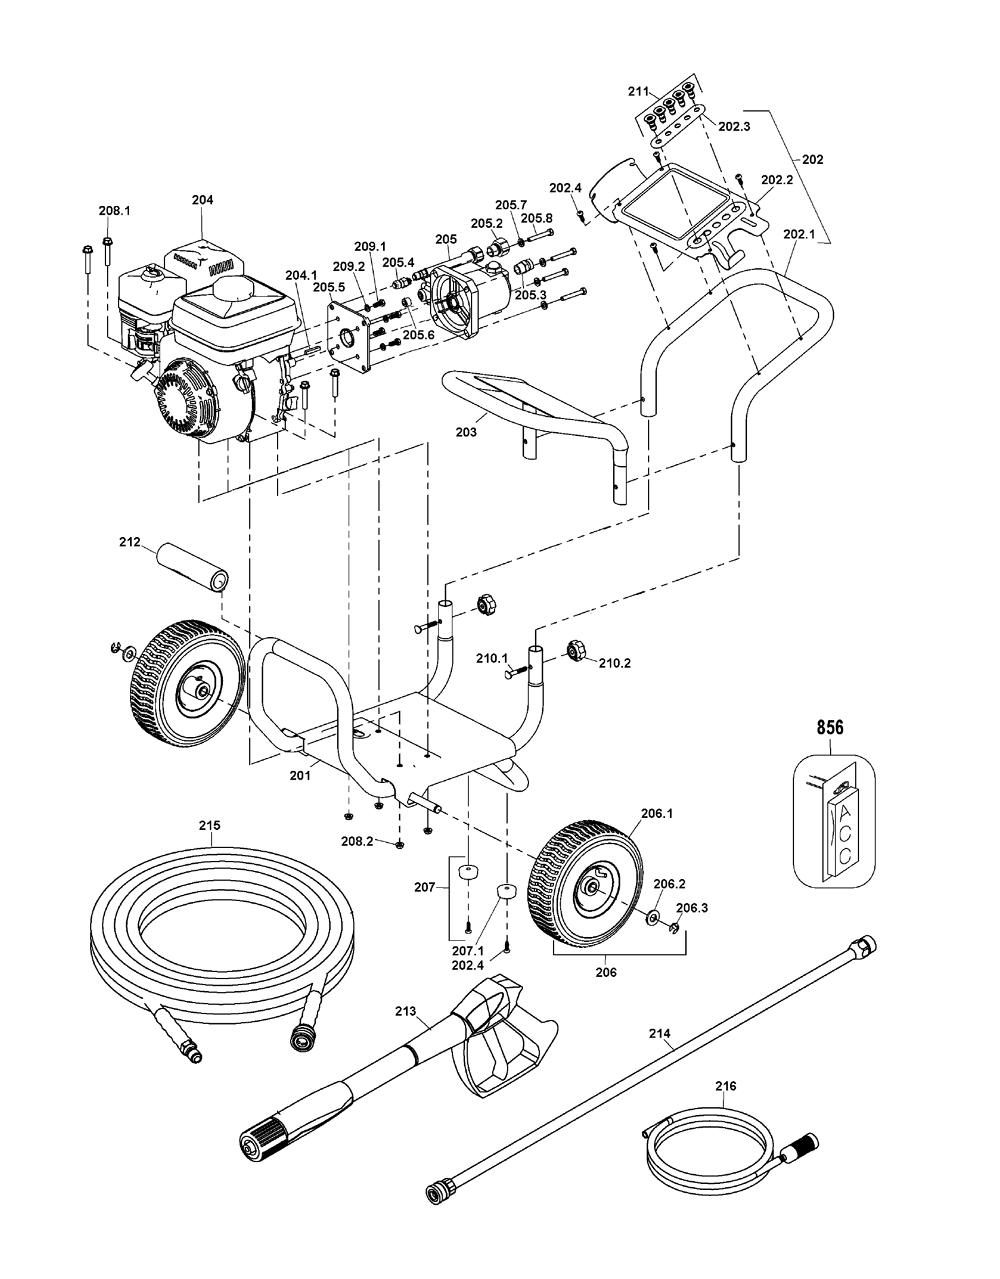 Stihl 042 Chainsaw Parts Diagram, Stihl, Free Engine Image